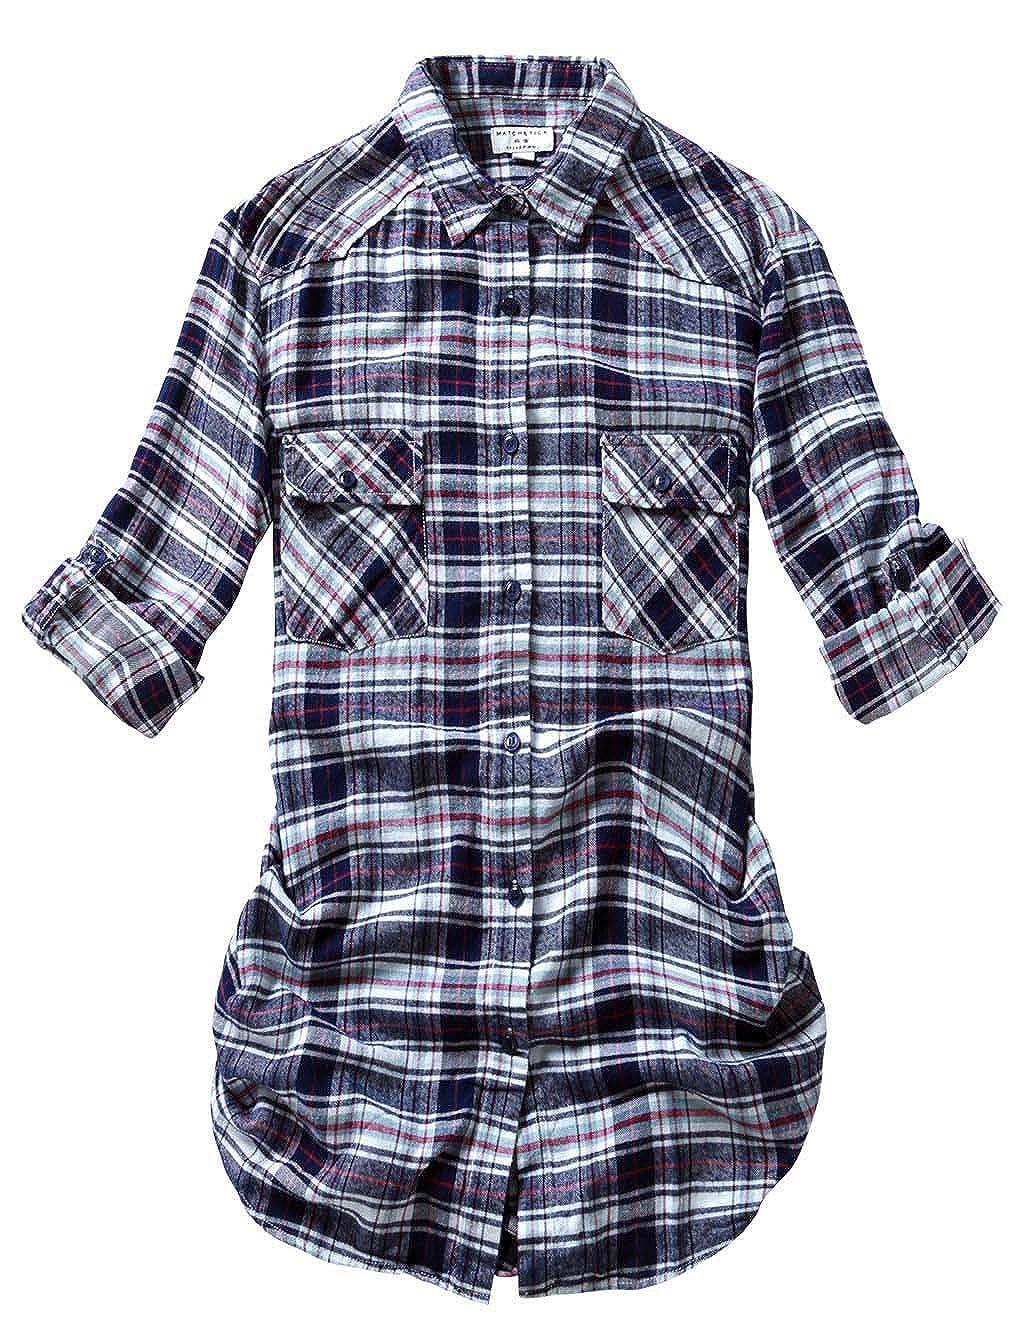 2022 Check 6 Match Women's Long Sleeve Flannel Plaid Shirt